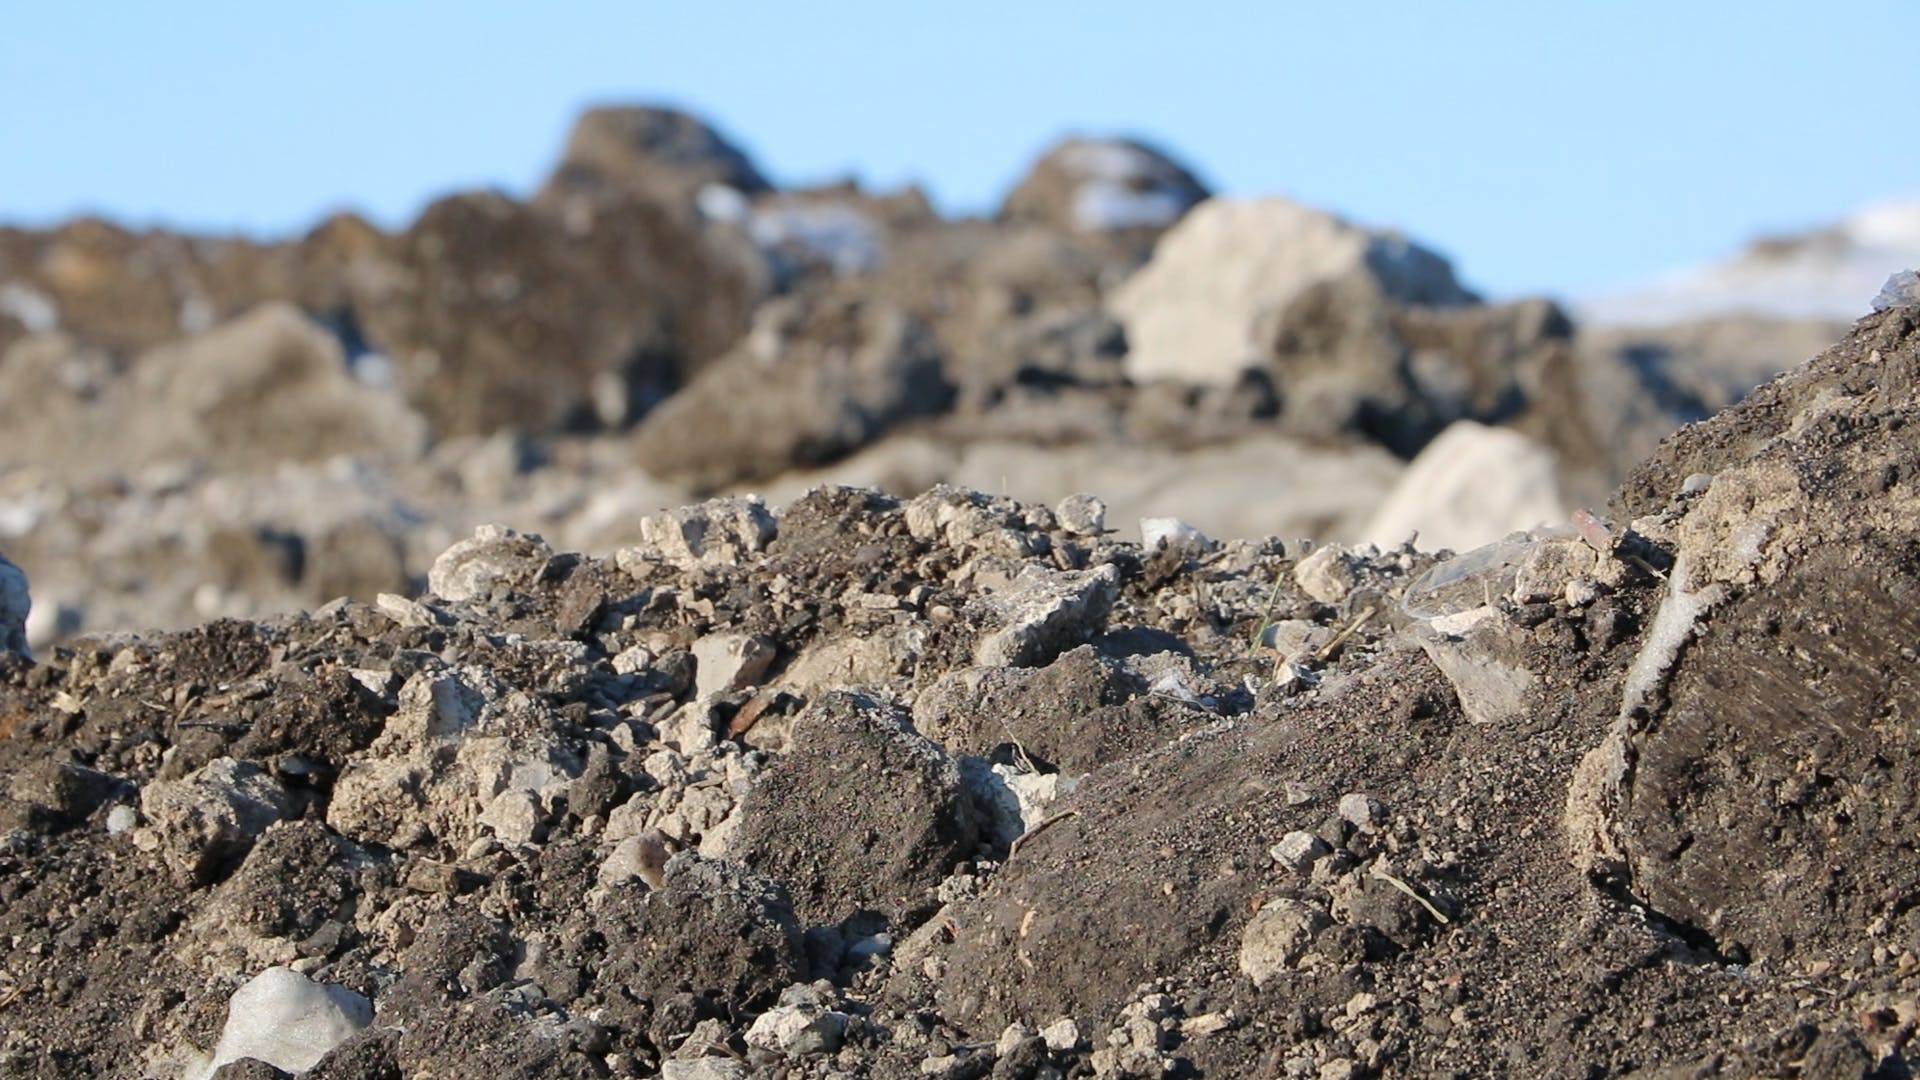 Soil Fabrication Image #1